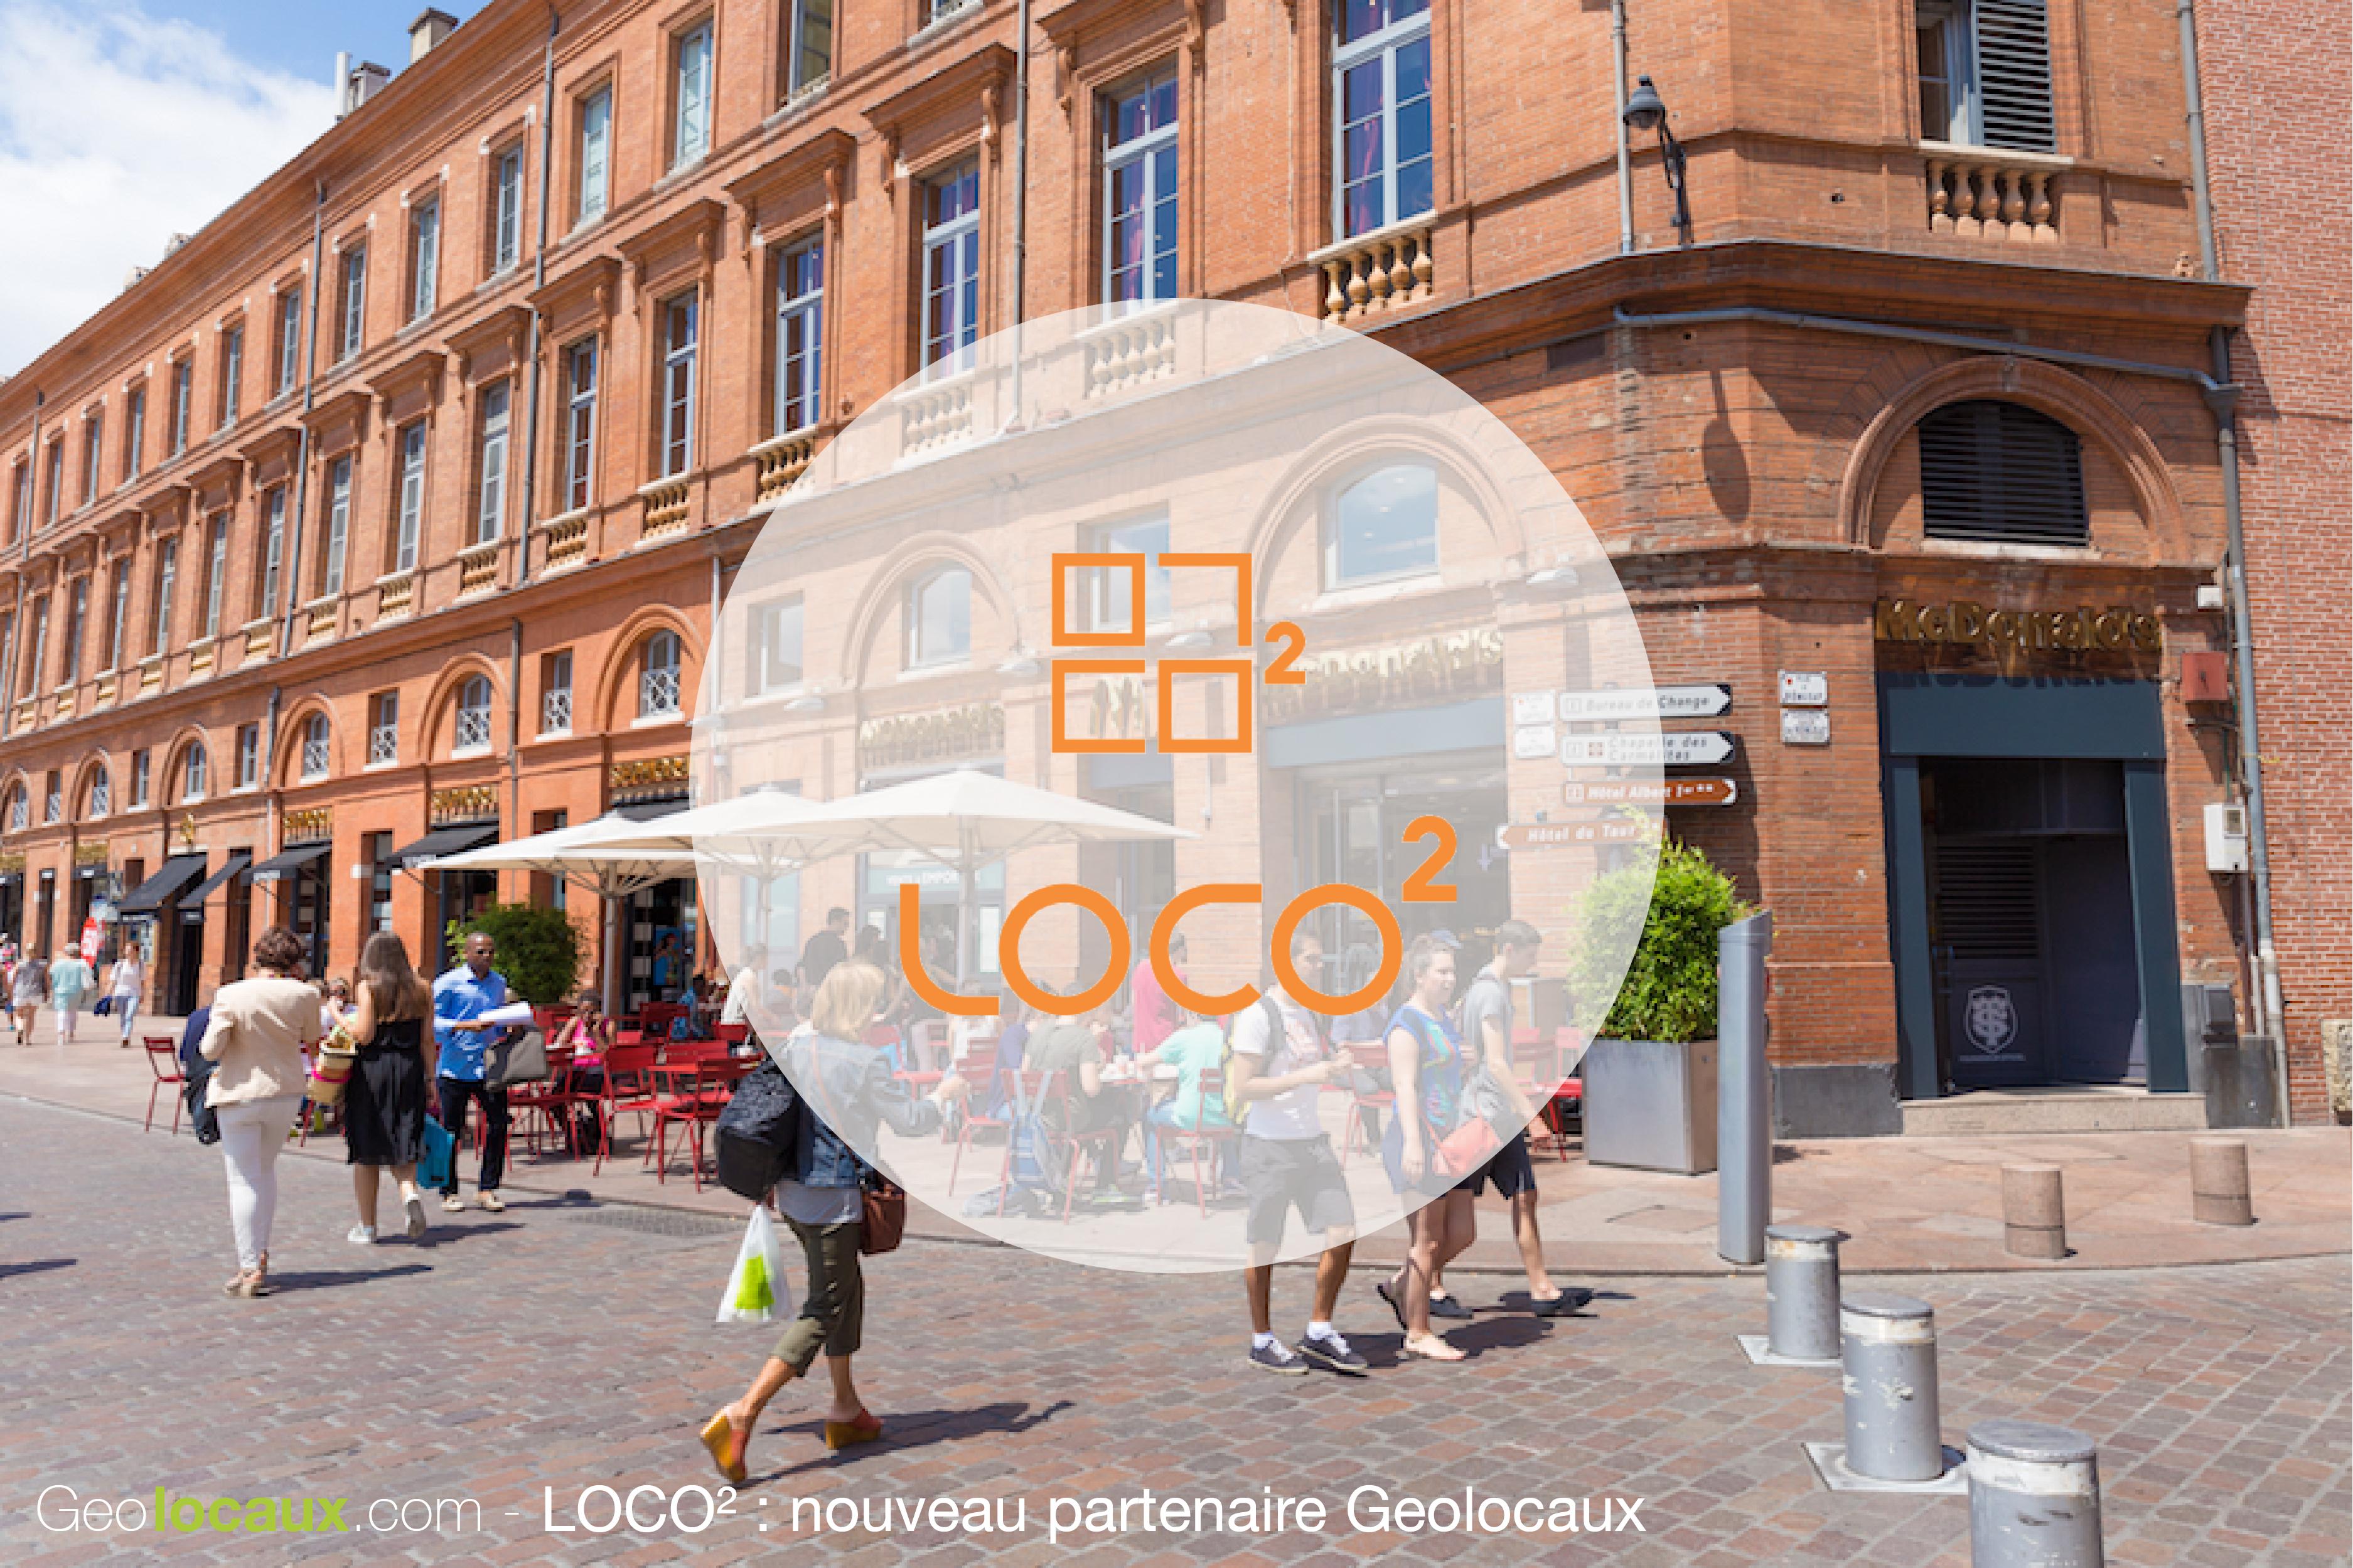 geolocaux loco² location vente entrepot bureaux